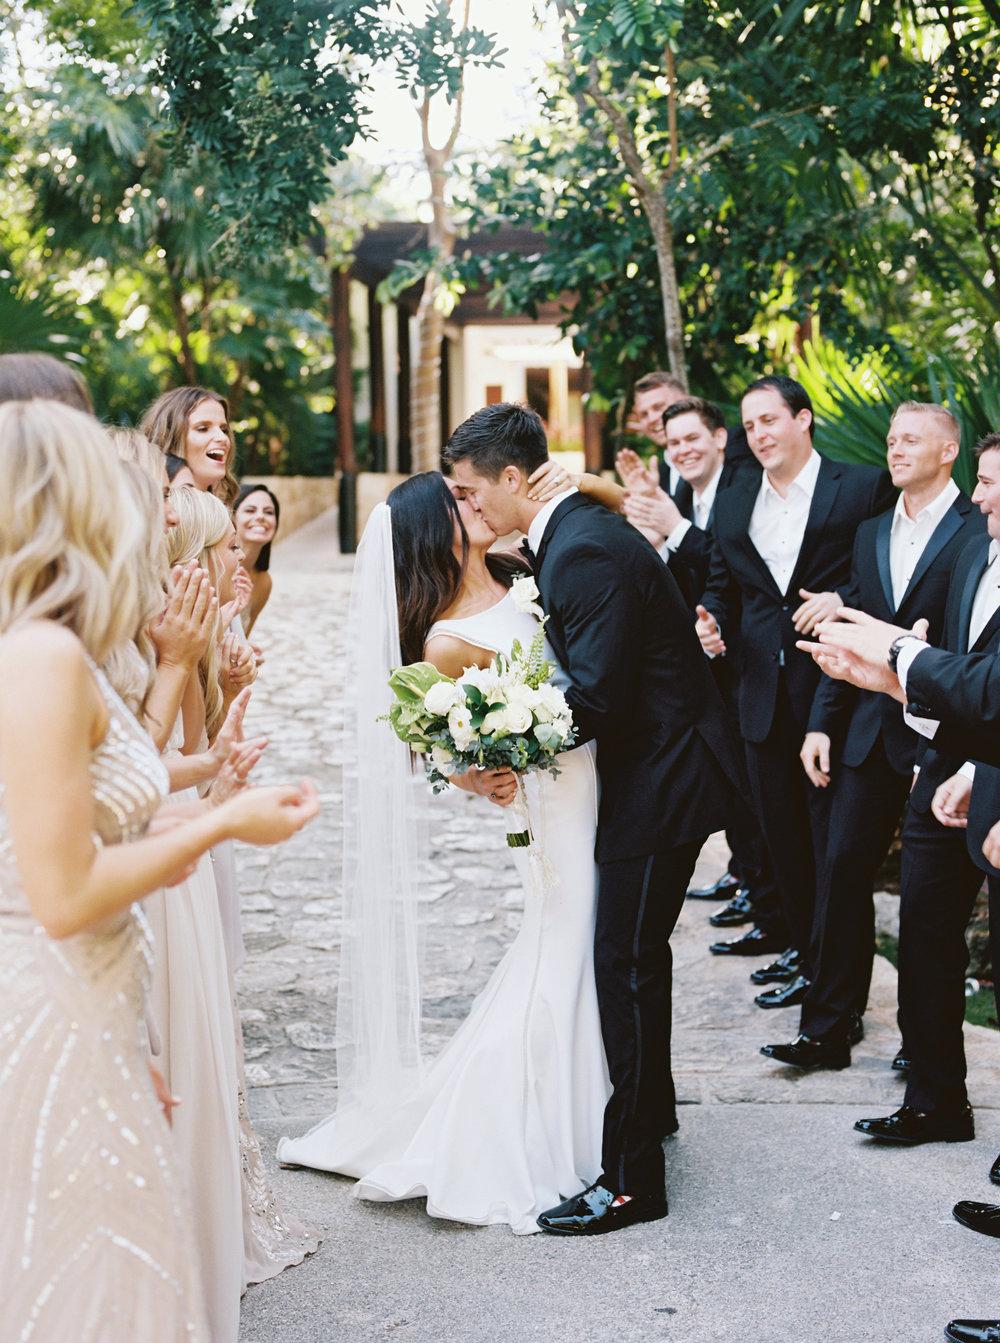 Kyle John l Fine Art Wedding Photography l Chicago, Copenhagen, California, New York, Destination l Blog l Brooke Boyd_The Film Poets_Tulum Wedding_18